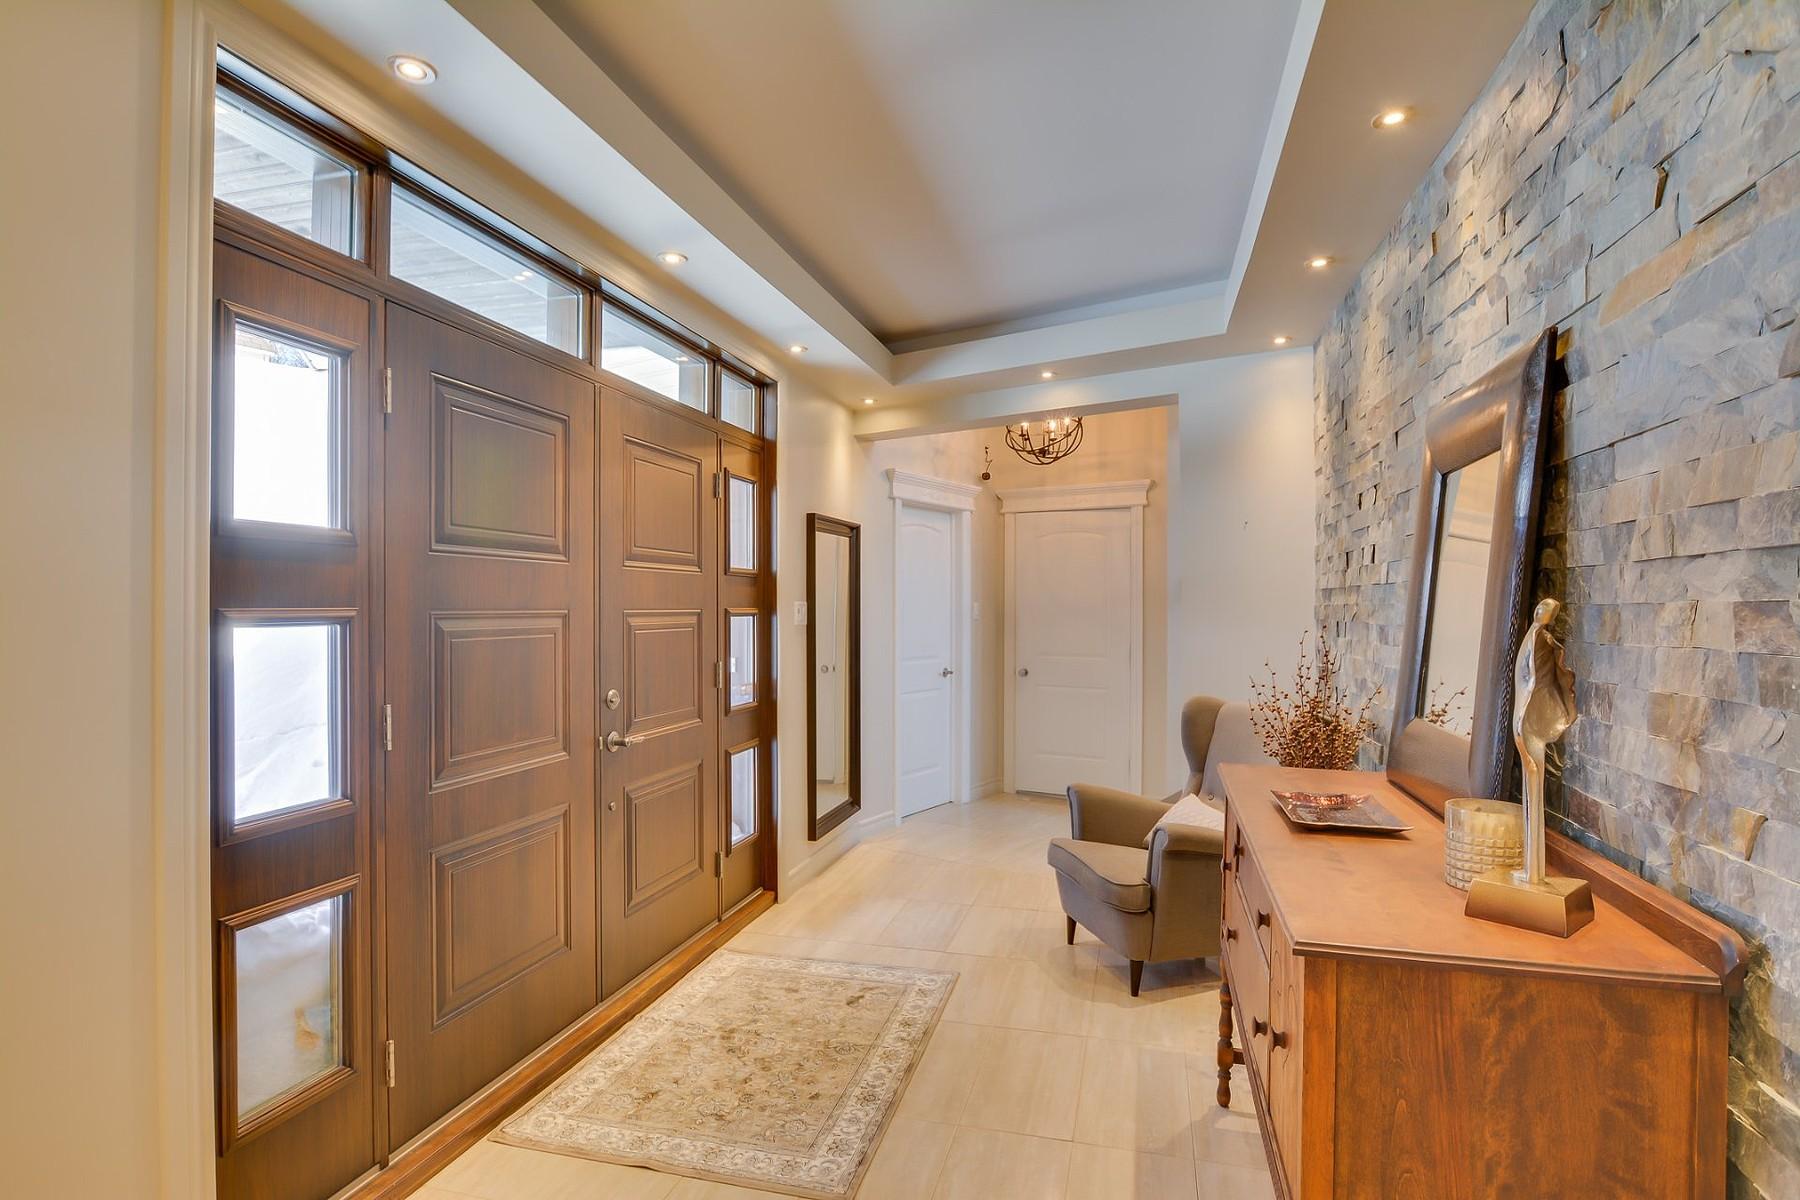 Single Family Homes for Sale at Saint-Hippolyte, Laurentides 35 Rue Champêtre Saint-Hippolyte, Quebec J8A3P9 Canada